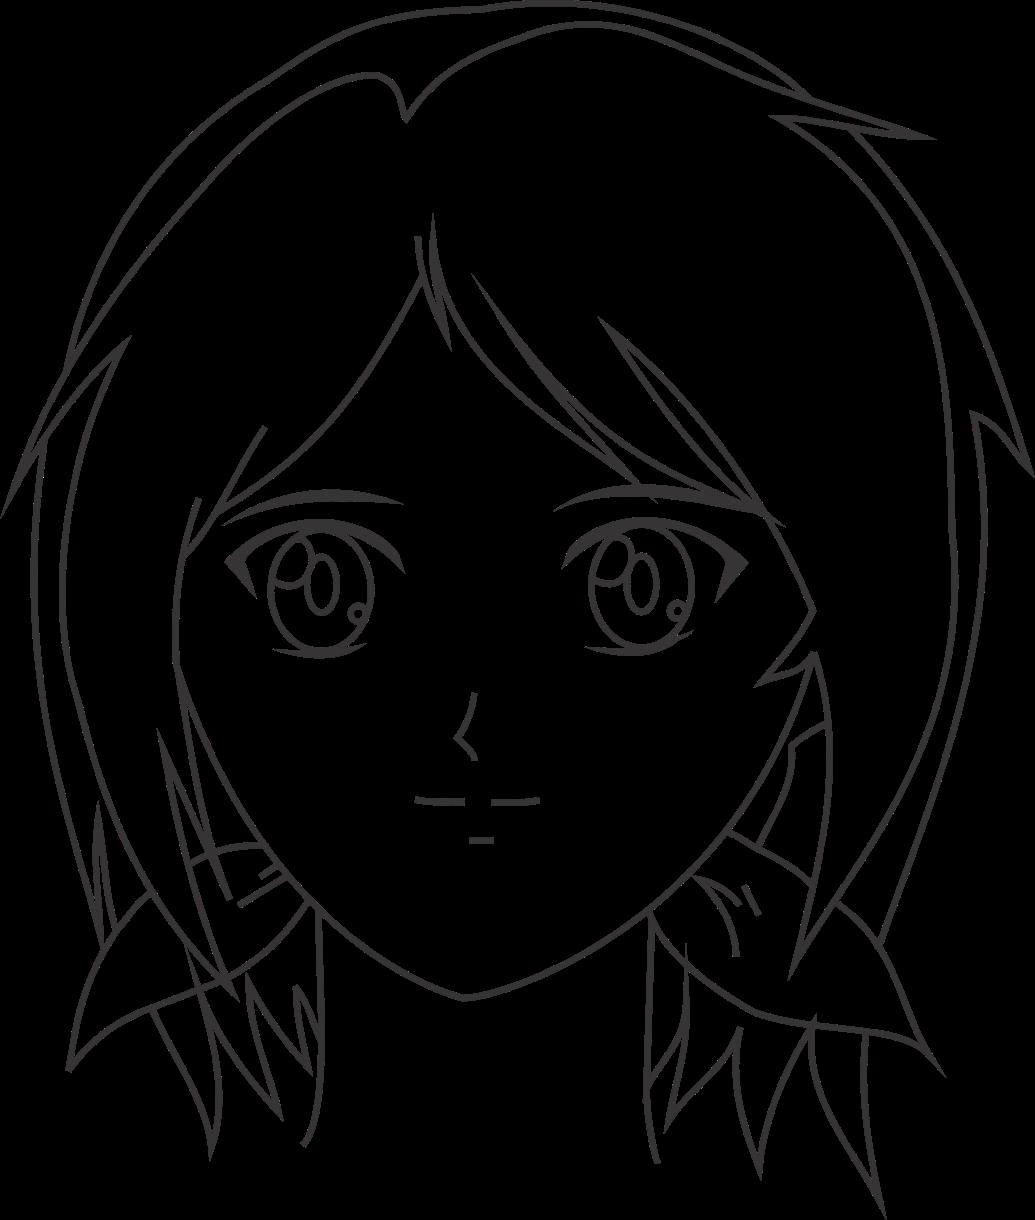 Cara Menggambar Anime Dengan Mudah Untuk Kamu Yang Masih